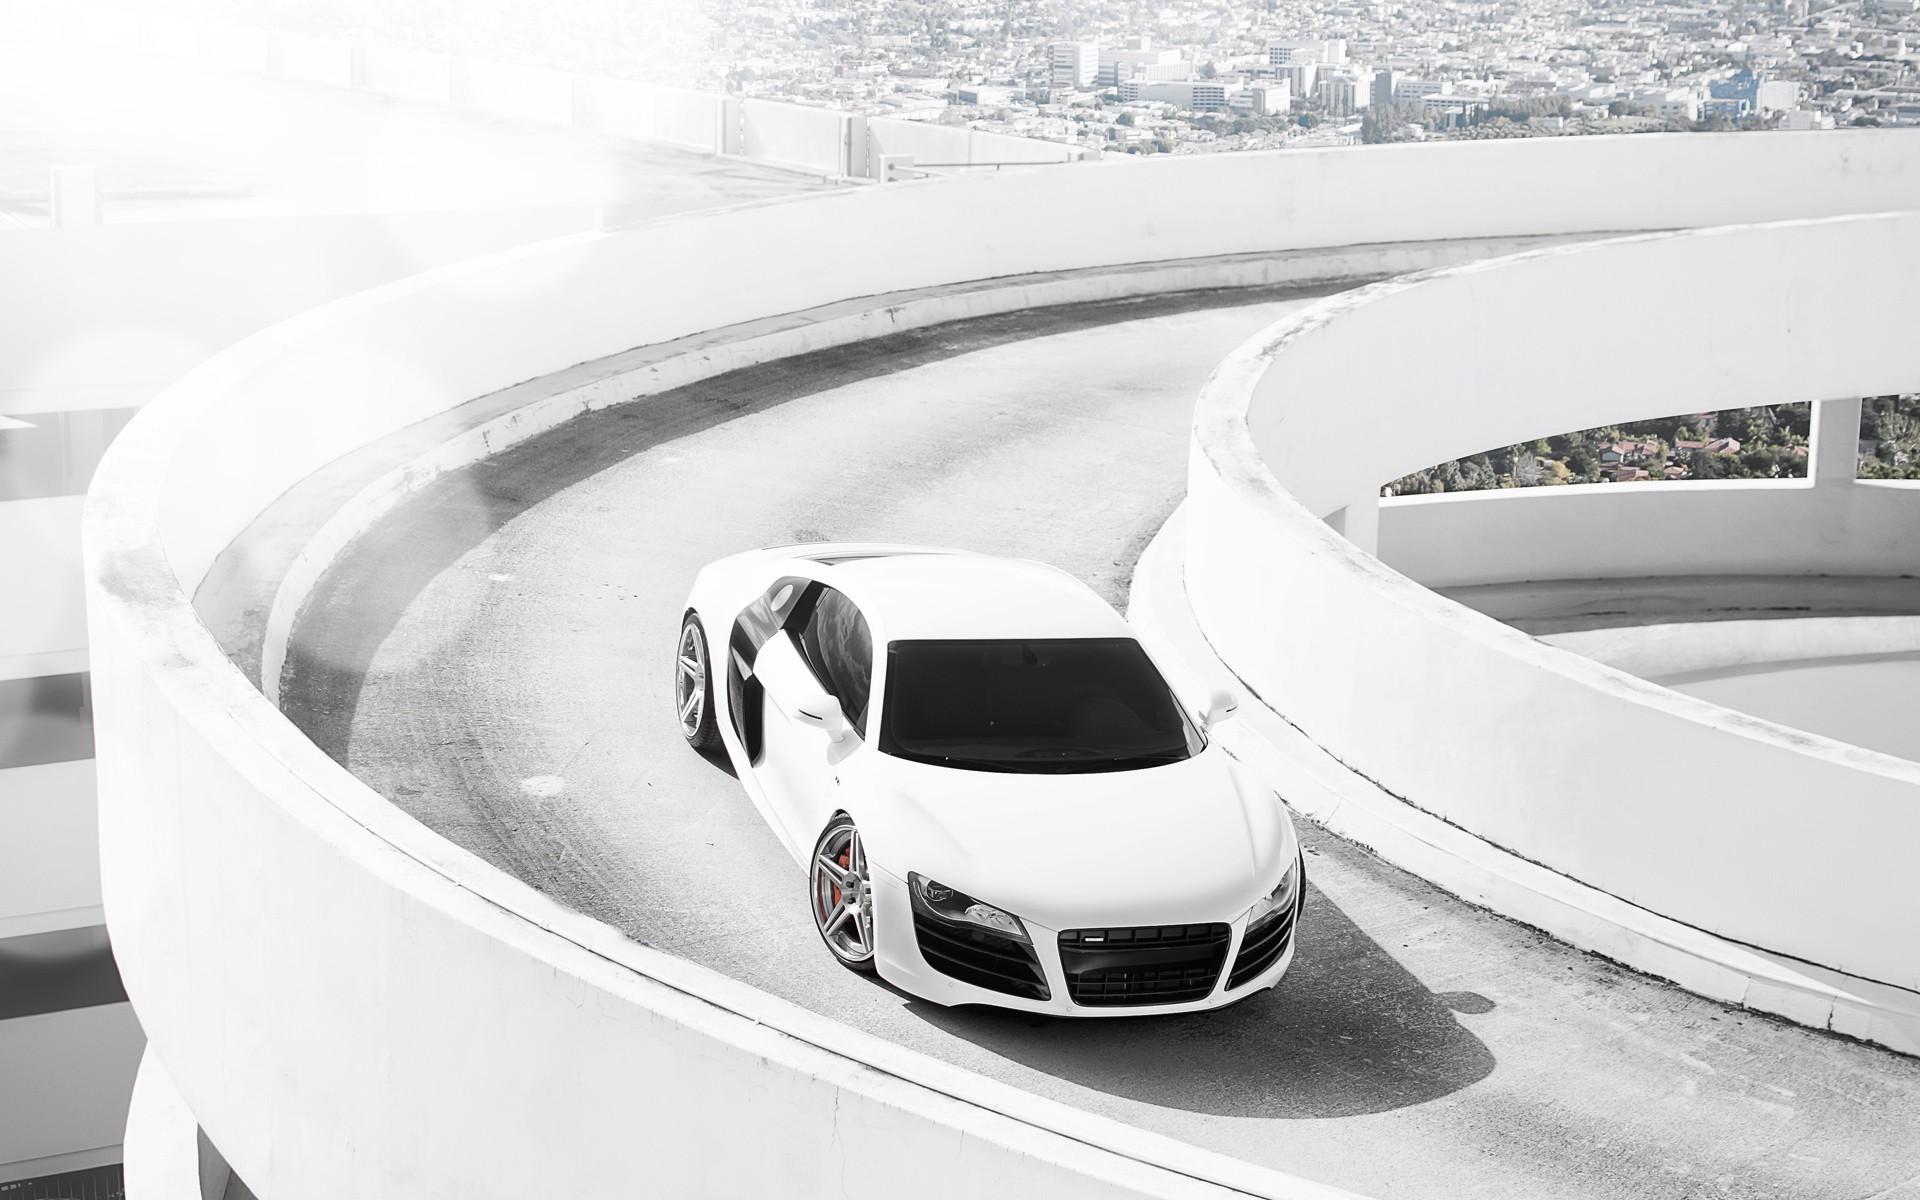 Audi R8 White Wallpaper Hd Car Wallpapers Id 2601